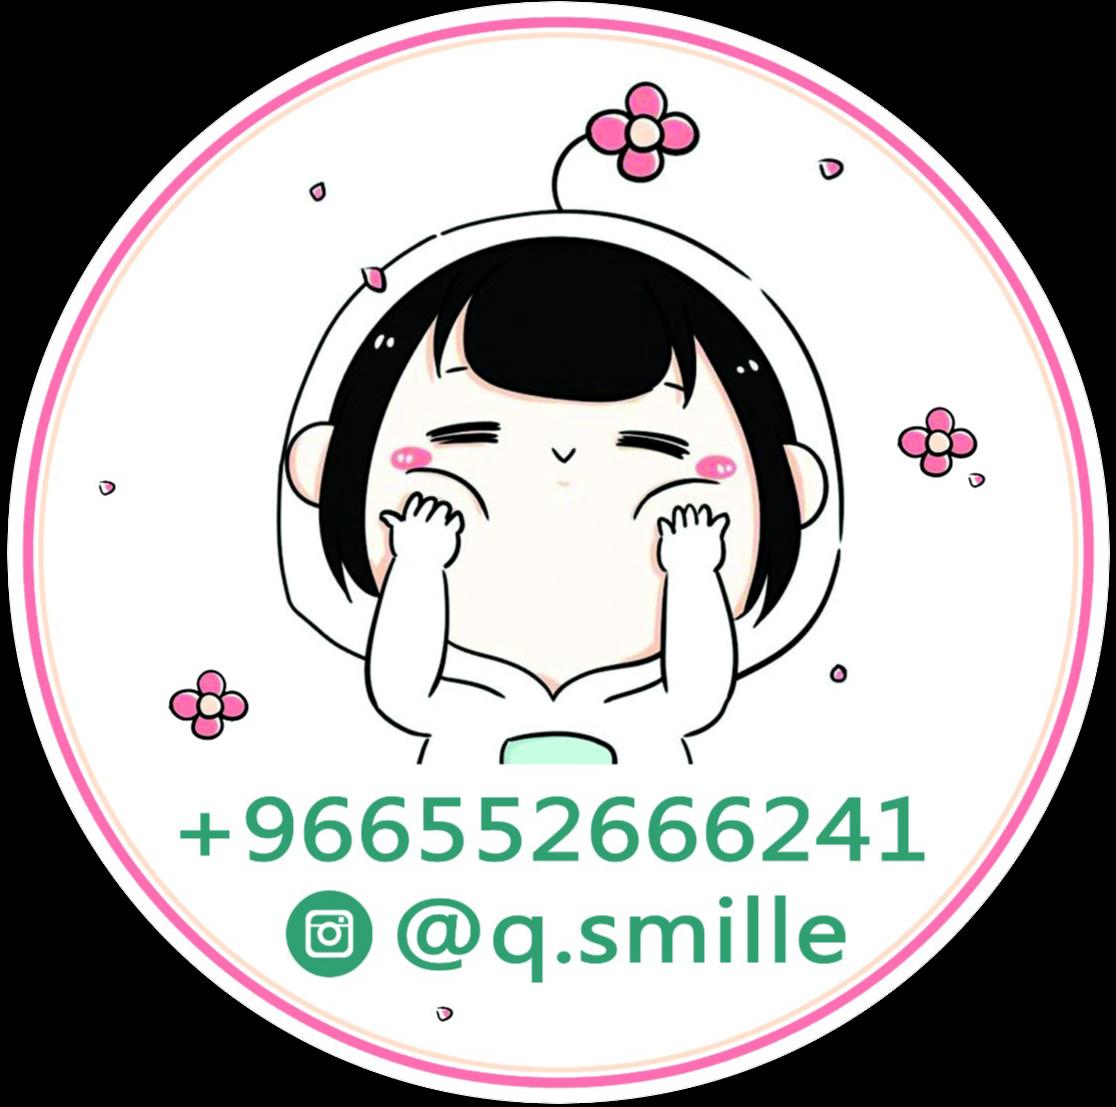 Q.smille